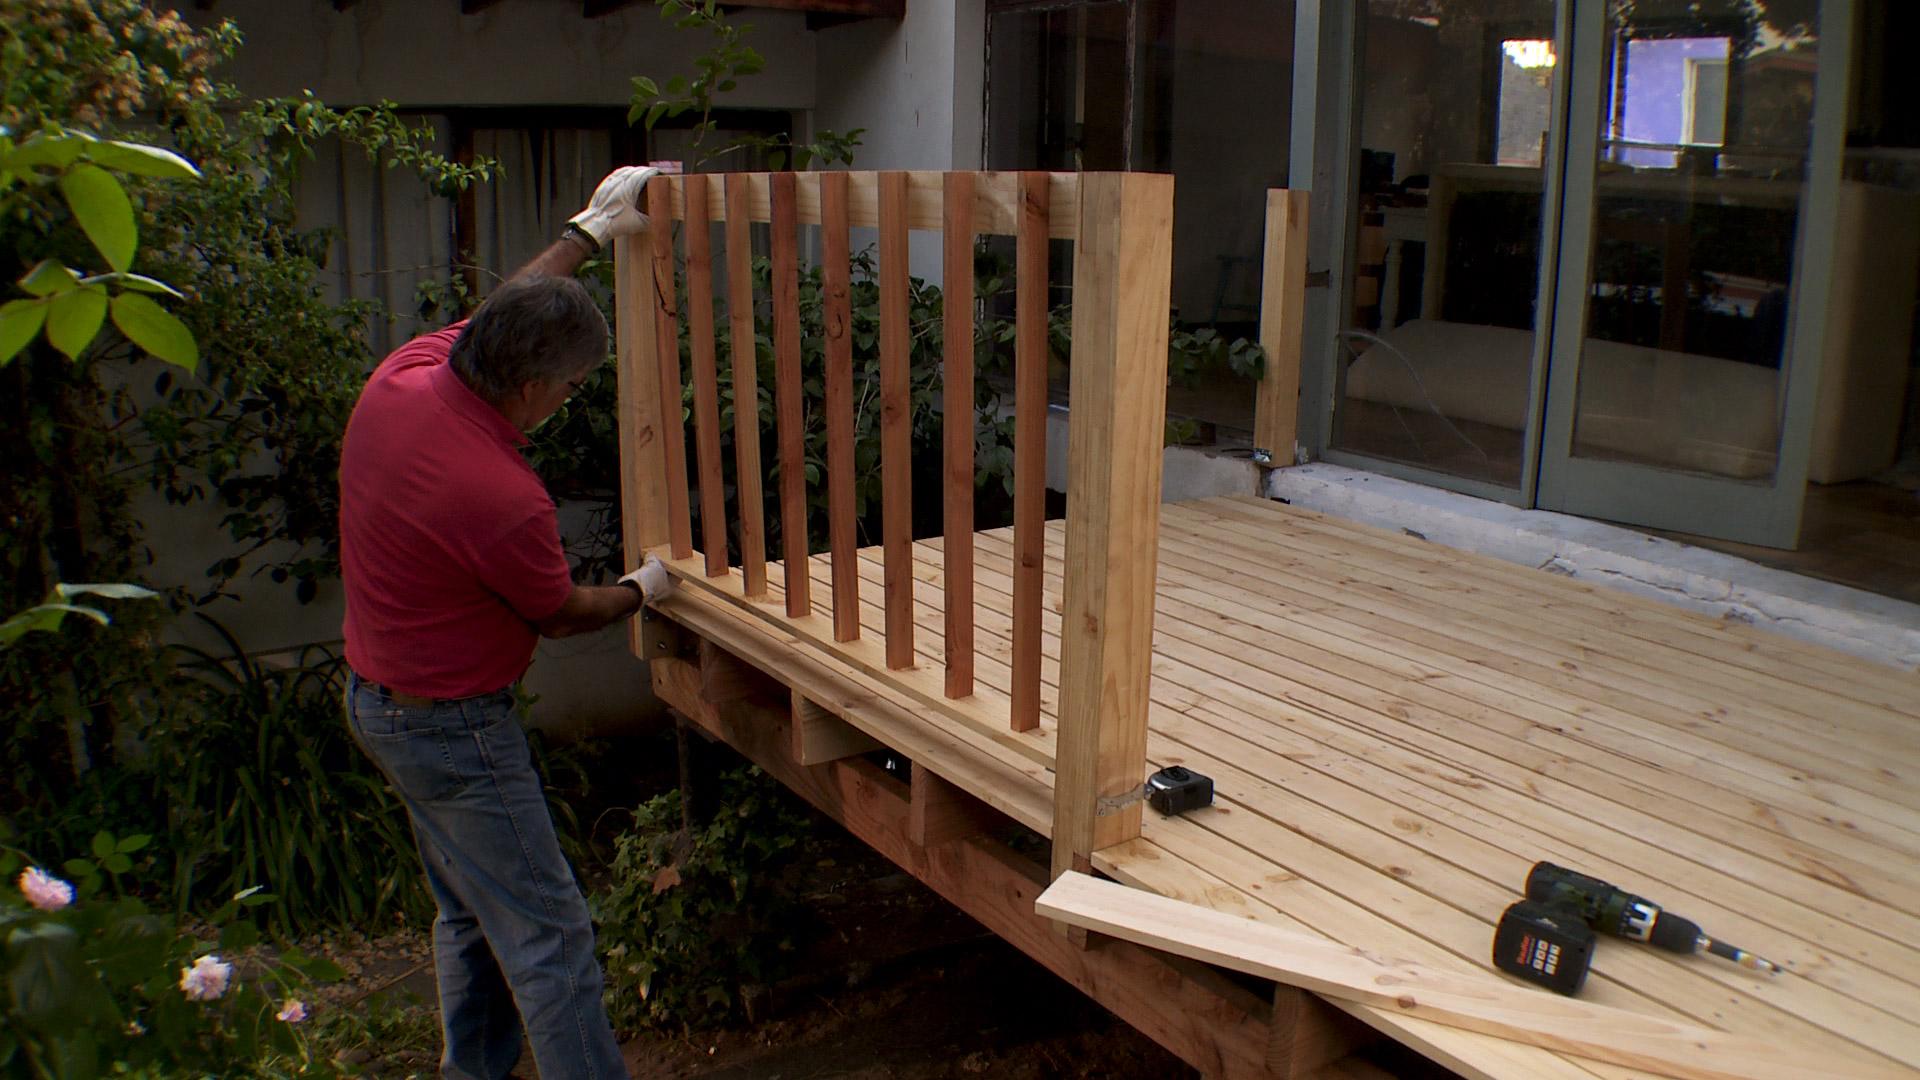 H galo usted mismo c mo construir una terraza de madera - Madera para terrazas ...